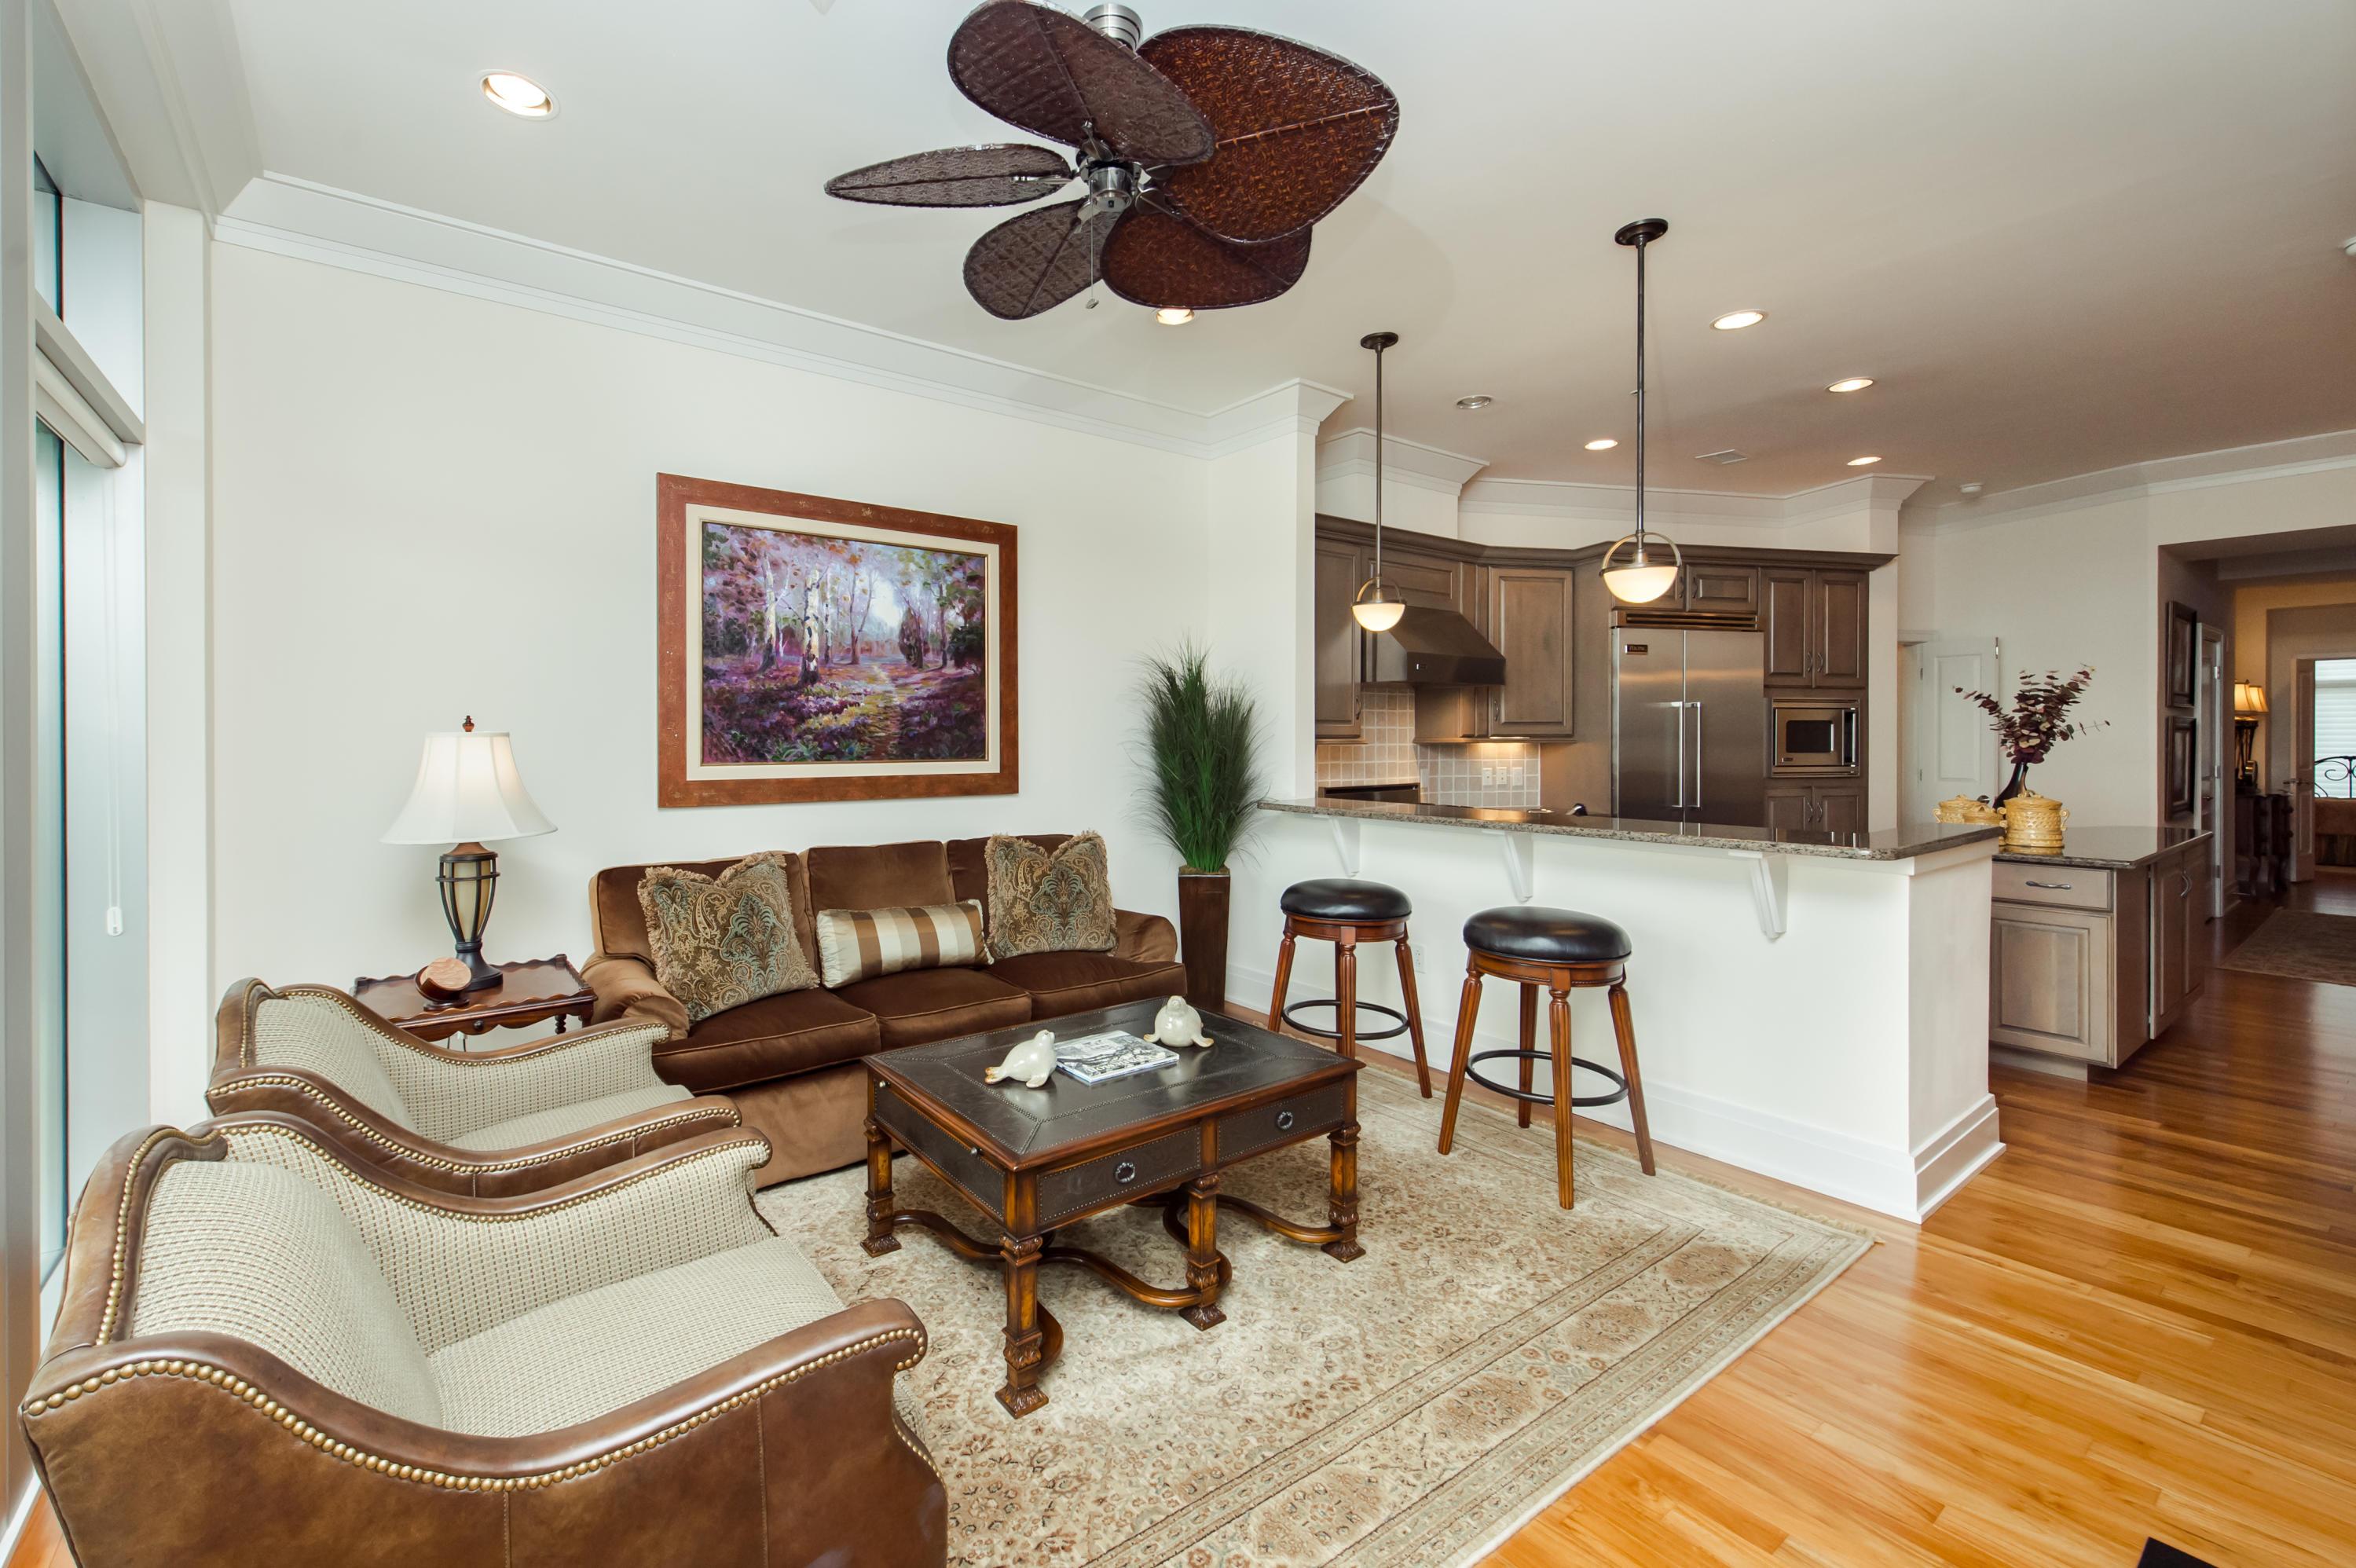 Tides Condominiums Homes For Sale - 124 Cooper River, Mount Pleasant, SC - 4